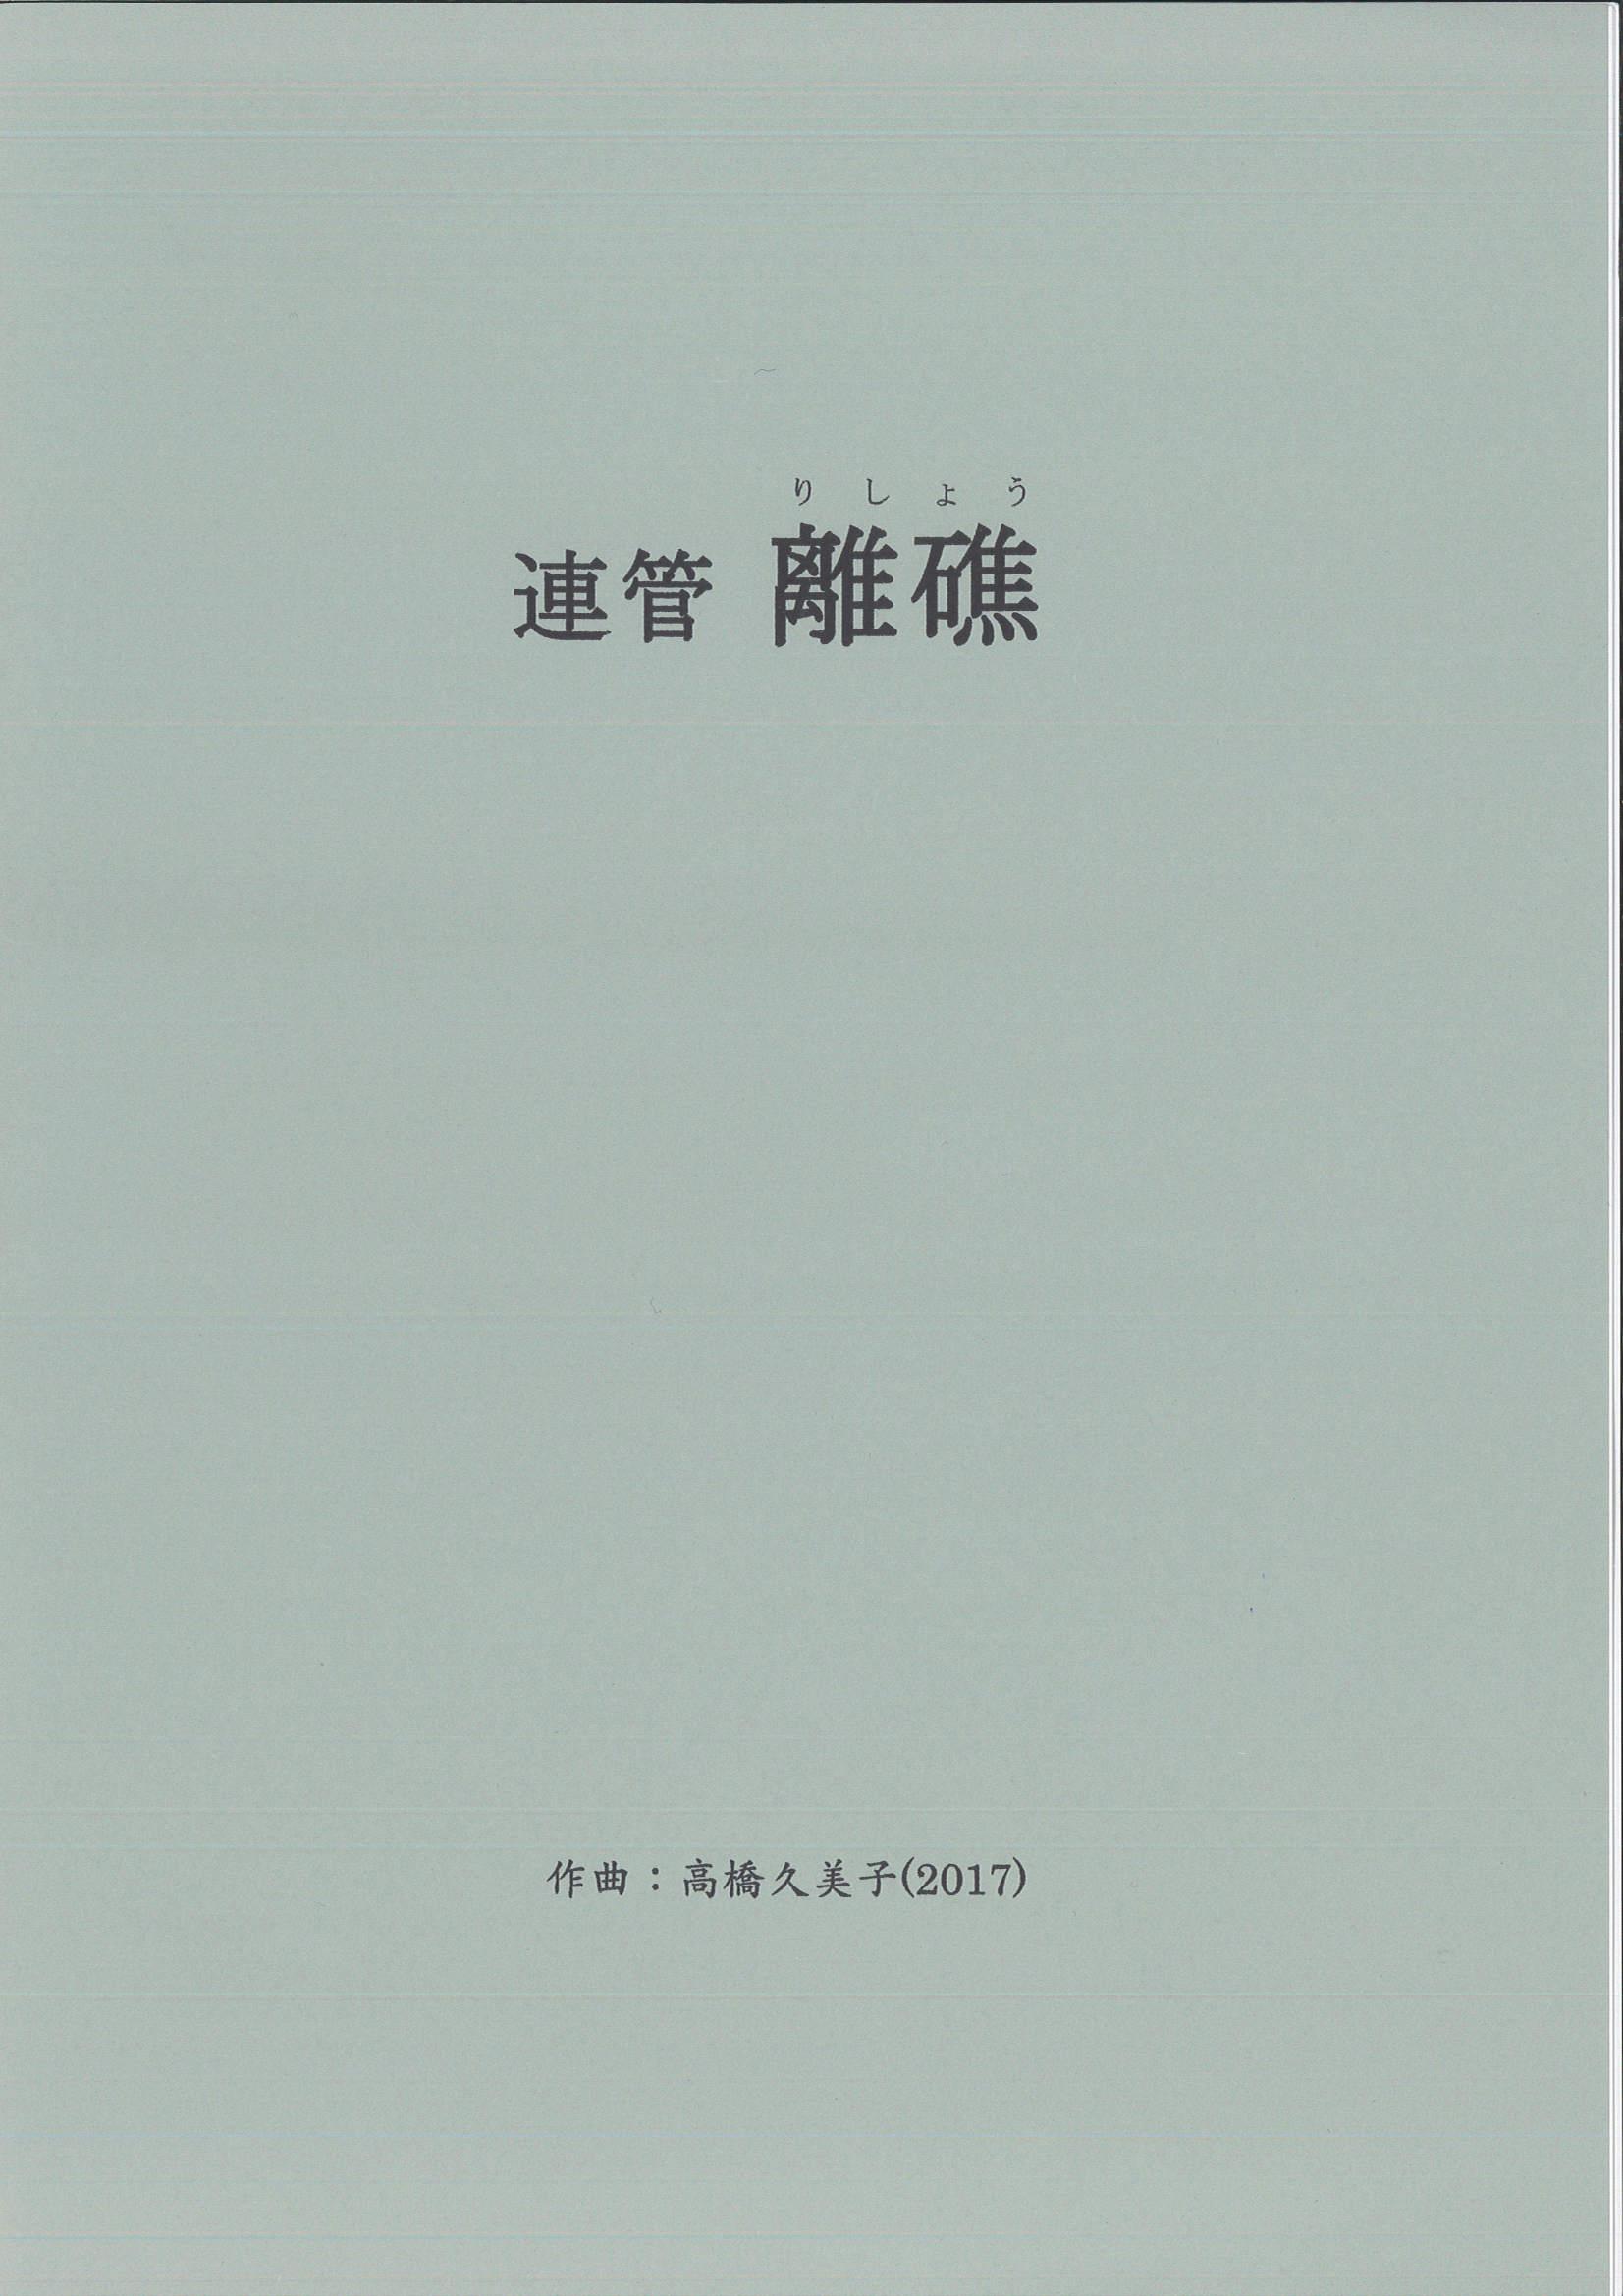 五線譜 連管 離礁[5618]